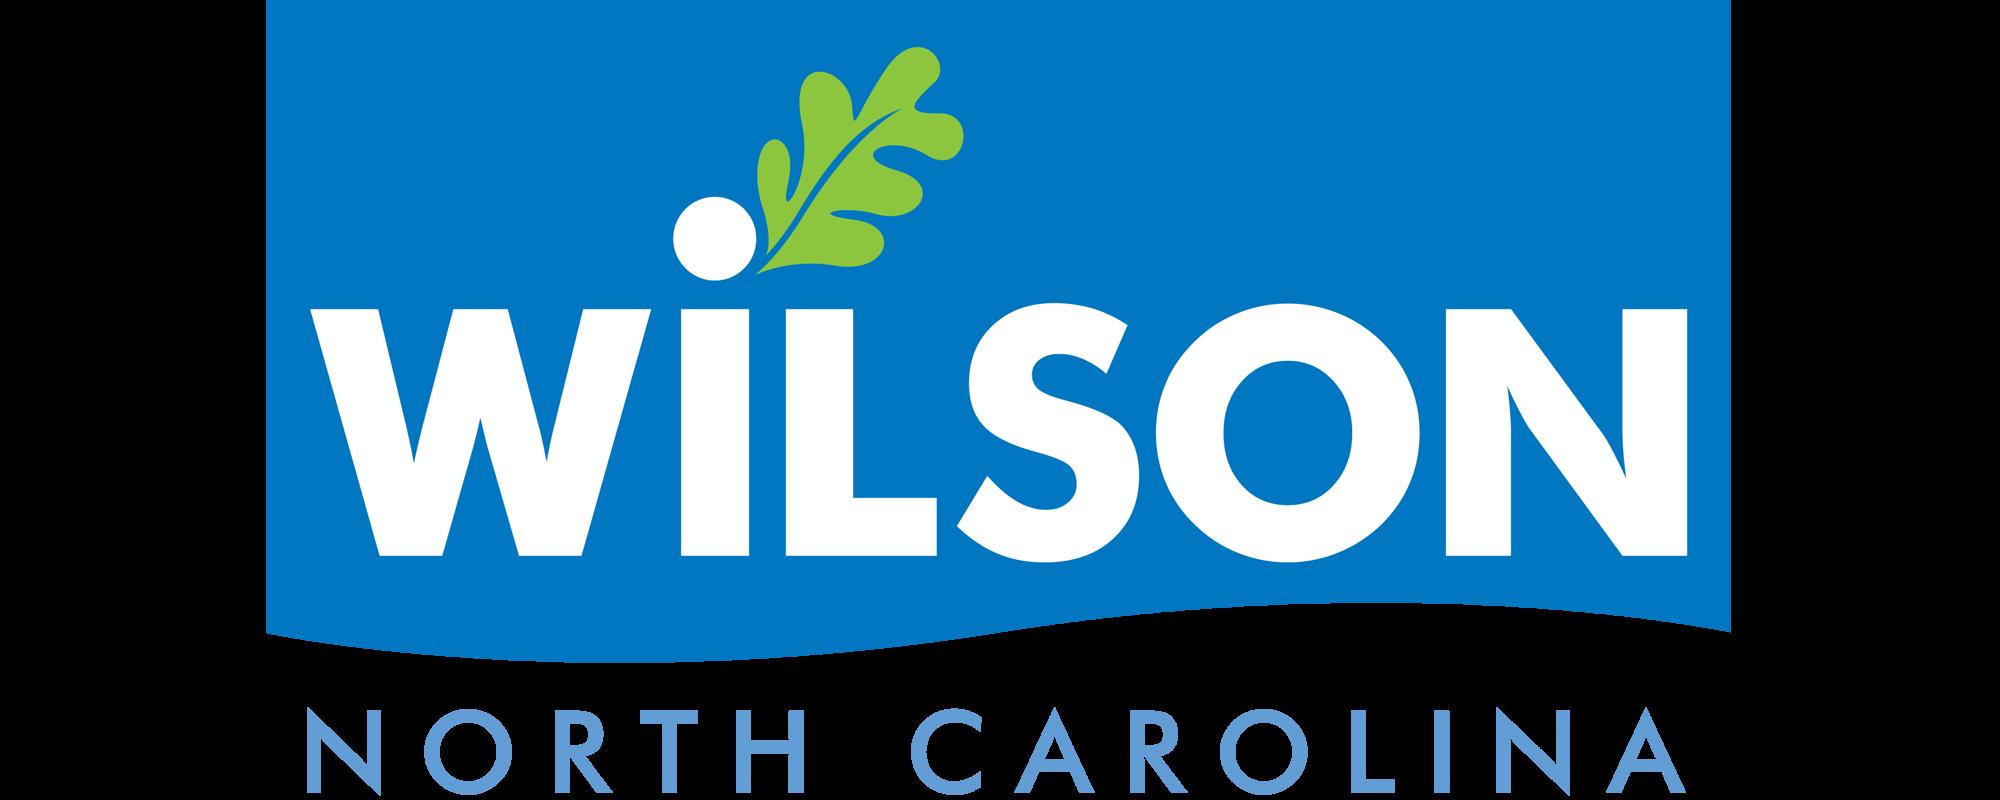 Gig EAST - City of Wilson Logo